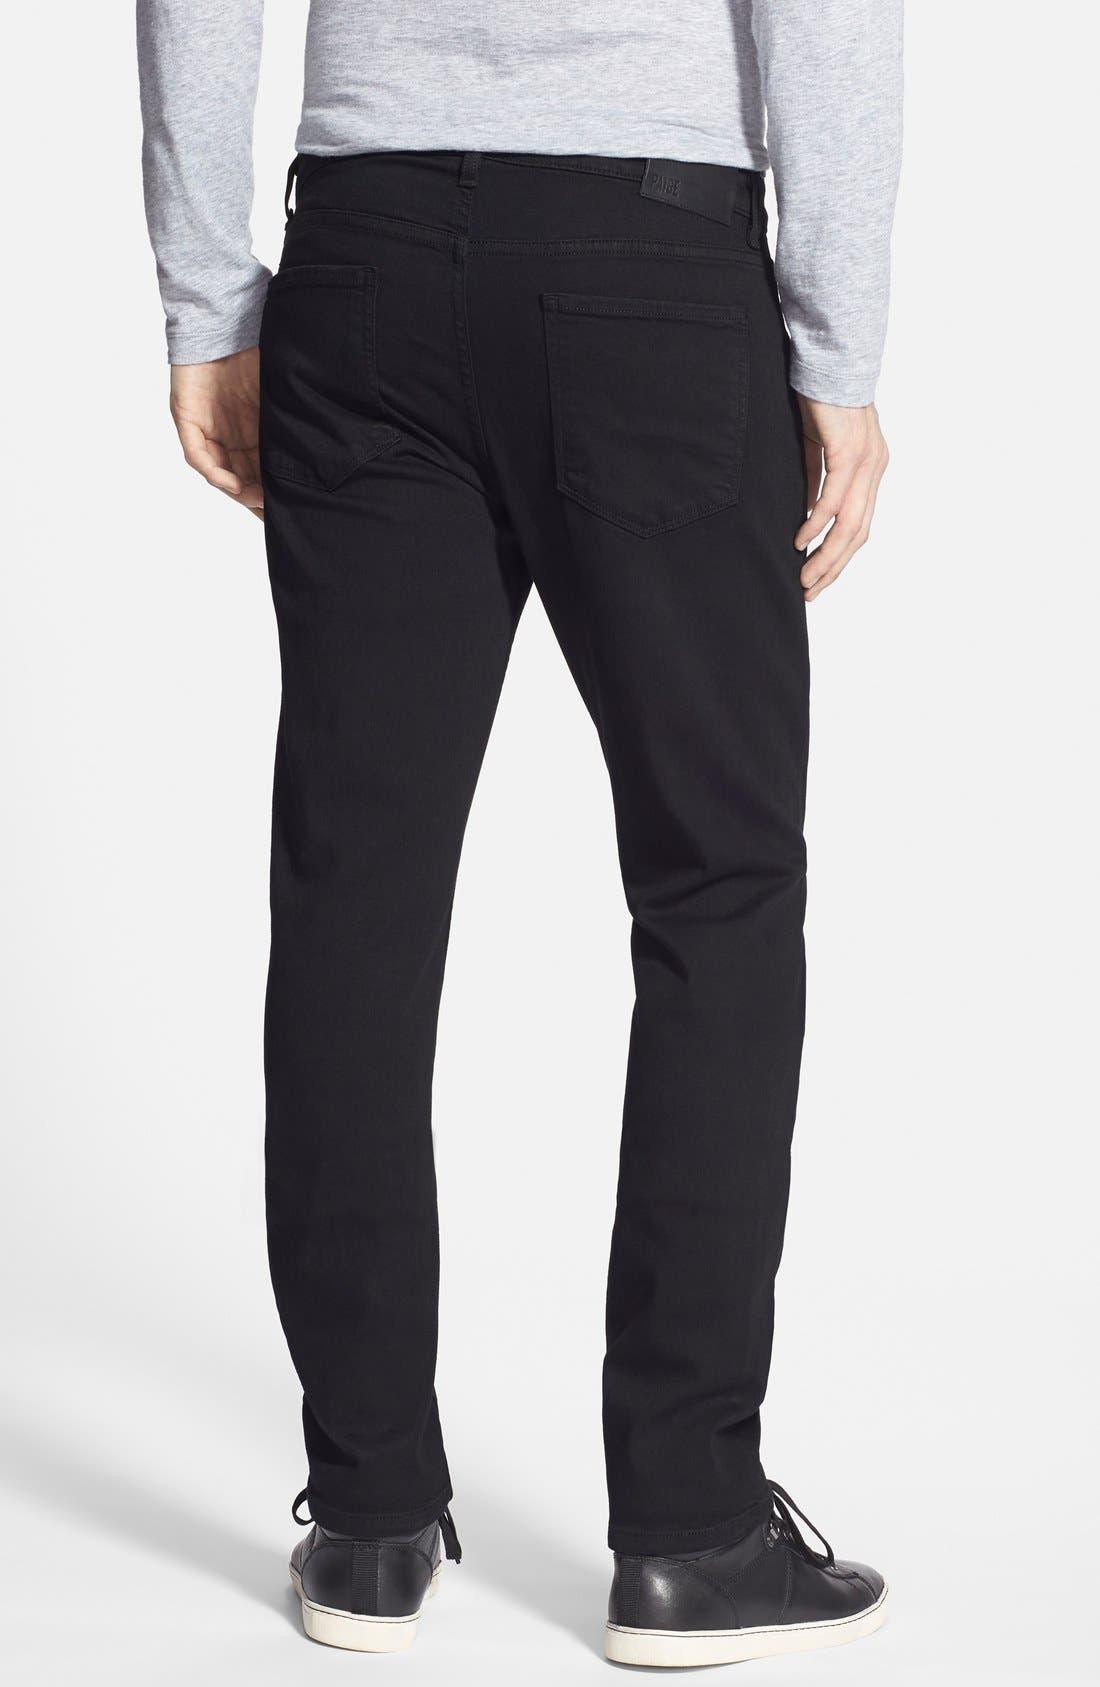 Alternate Image 2  - PAIGE Transcend - Lennox XL Slim Fit Jeans (Black Shadow) (Tall)